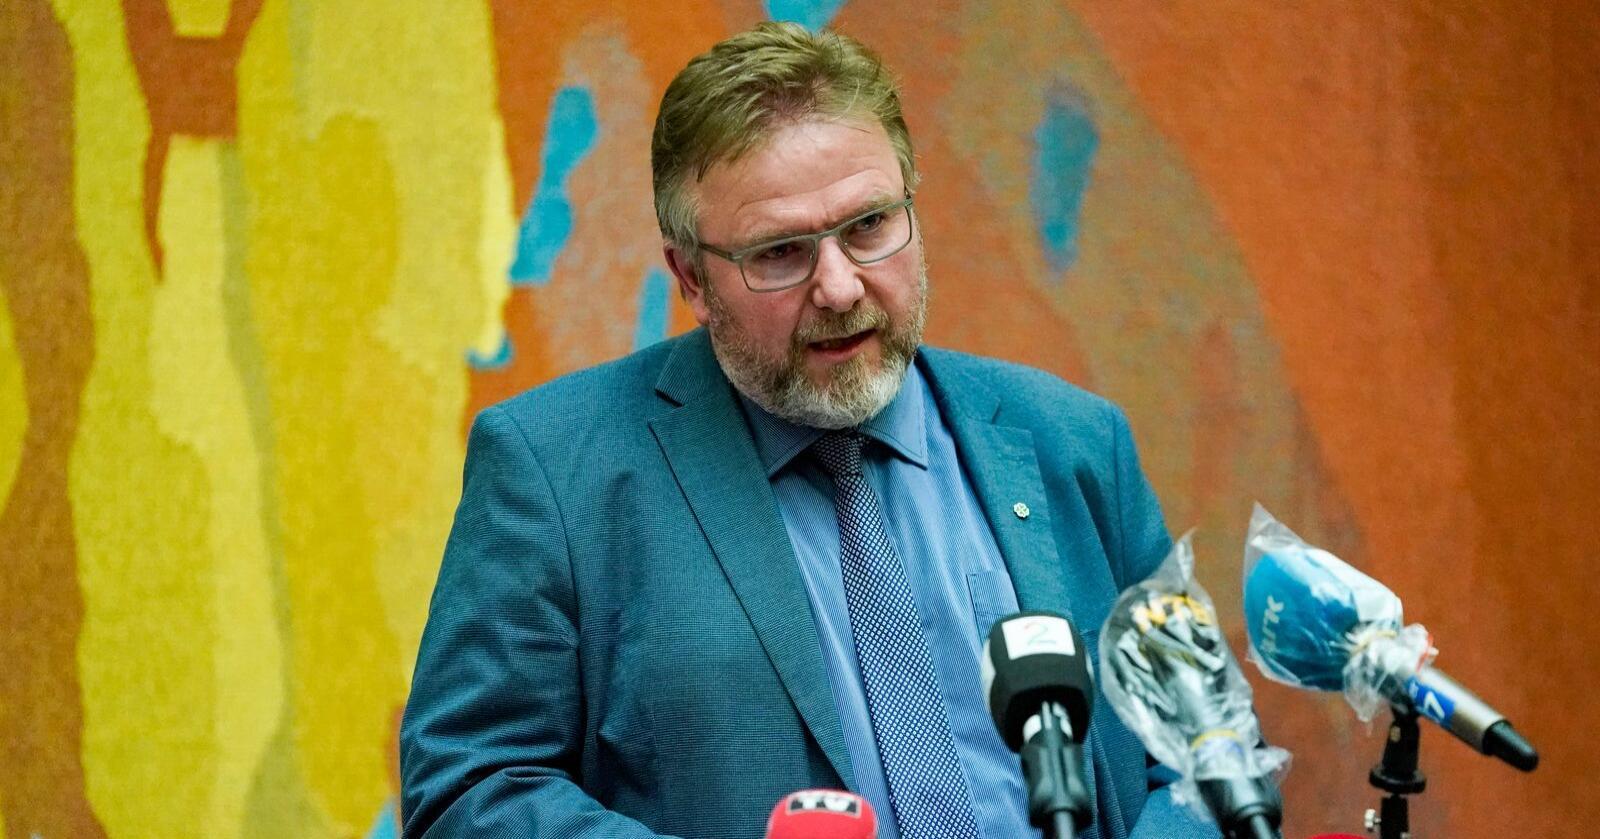 Norge må ta grep nå, skriver Bengt Fasteraune (Sp).Foto: Fredrik Hagen / NTB scanpix